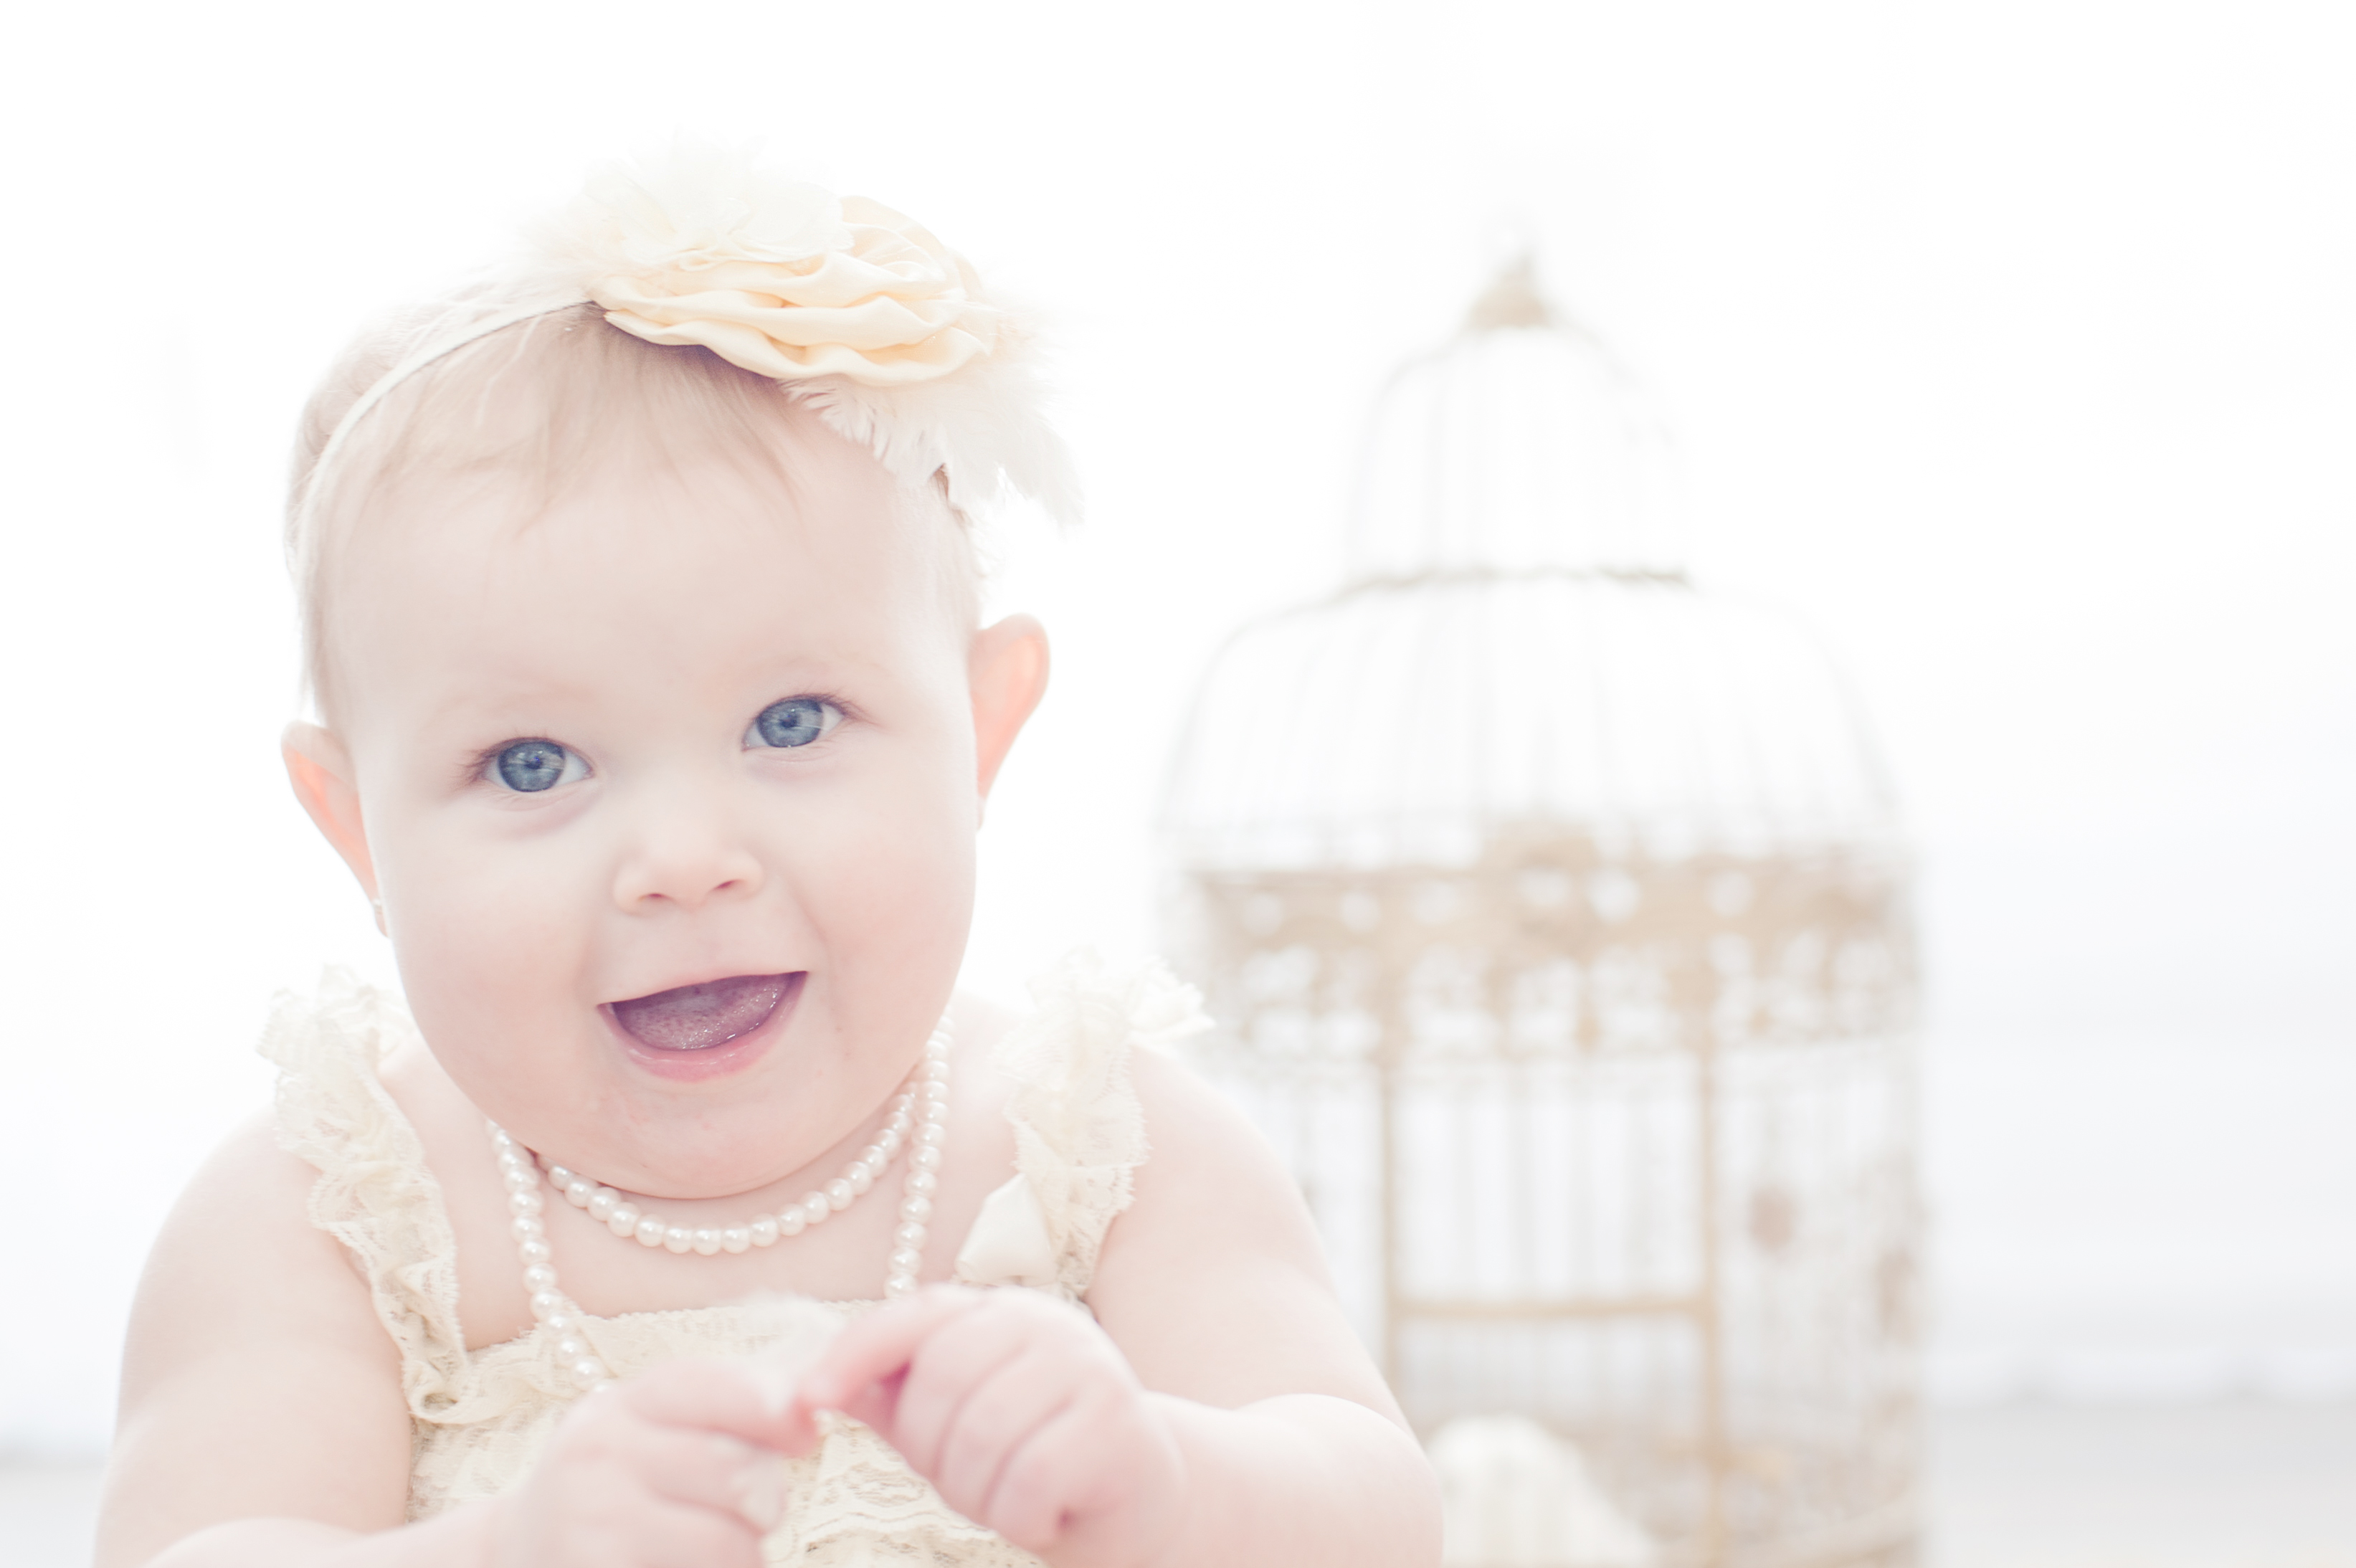 liz_czinege_niagara_hamilton_child_photographer12